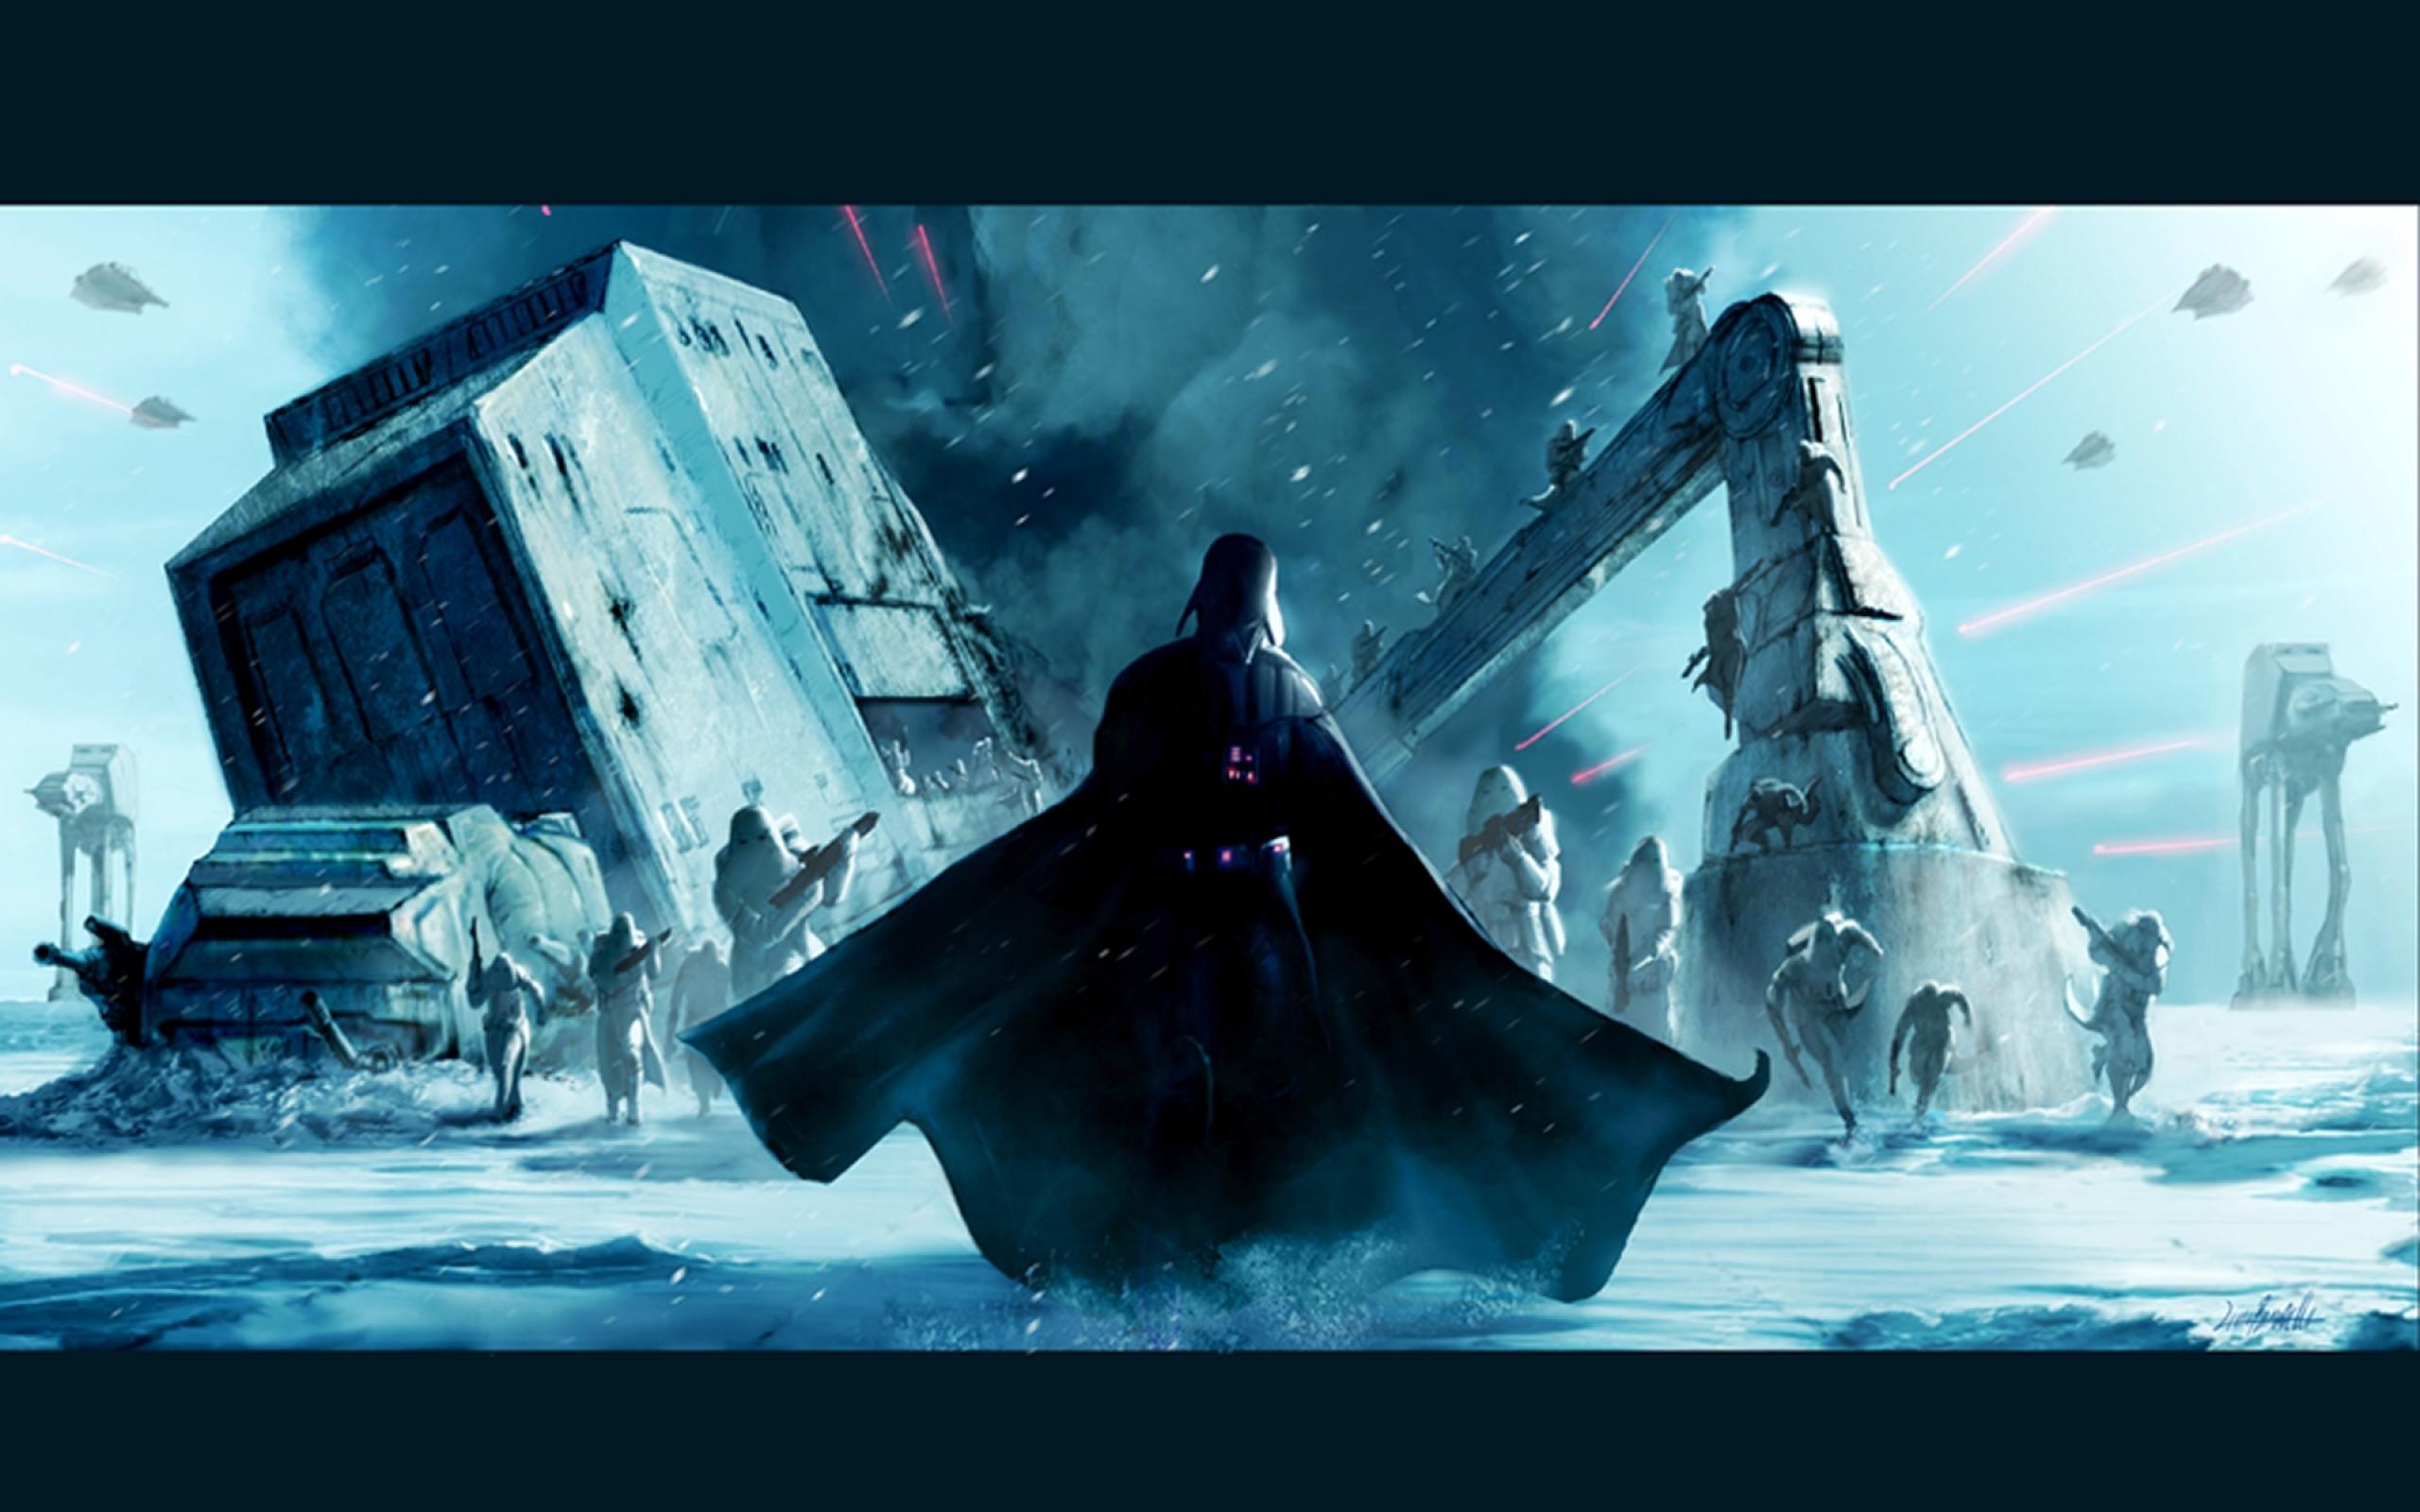 49 High Res Star Wars Wallpaper On Wallpapersafari